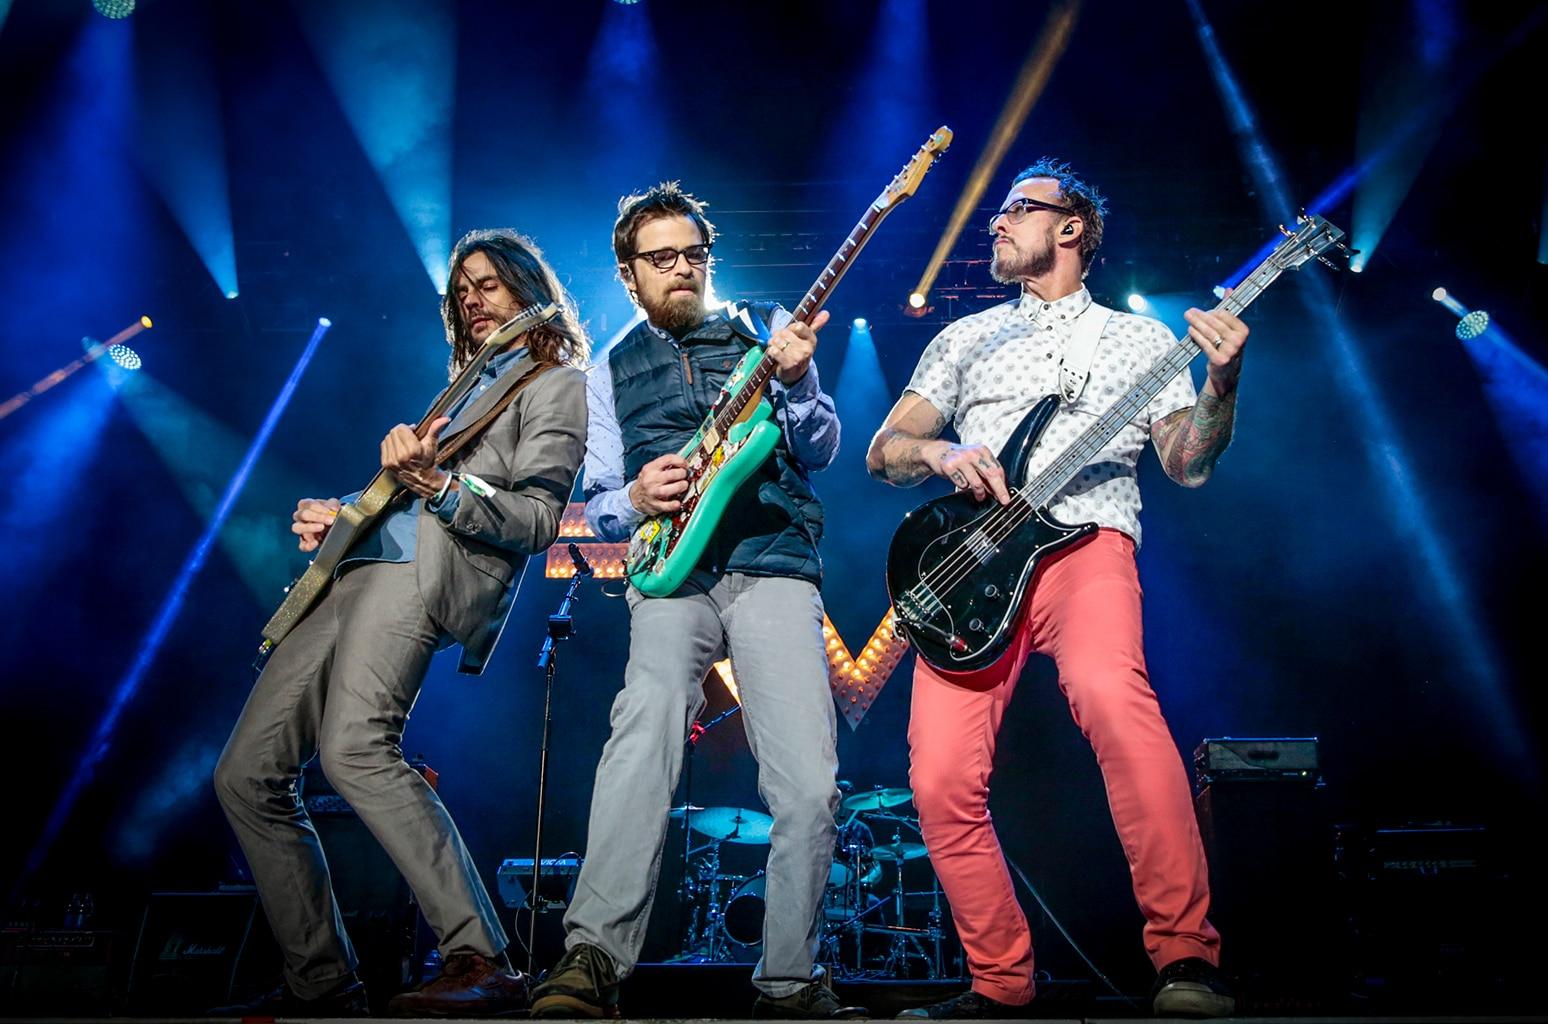 Weezer (Уизер): Биография группы